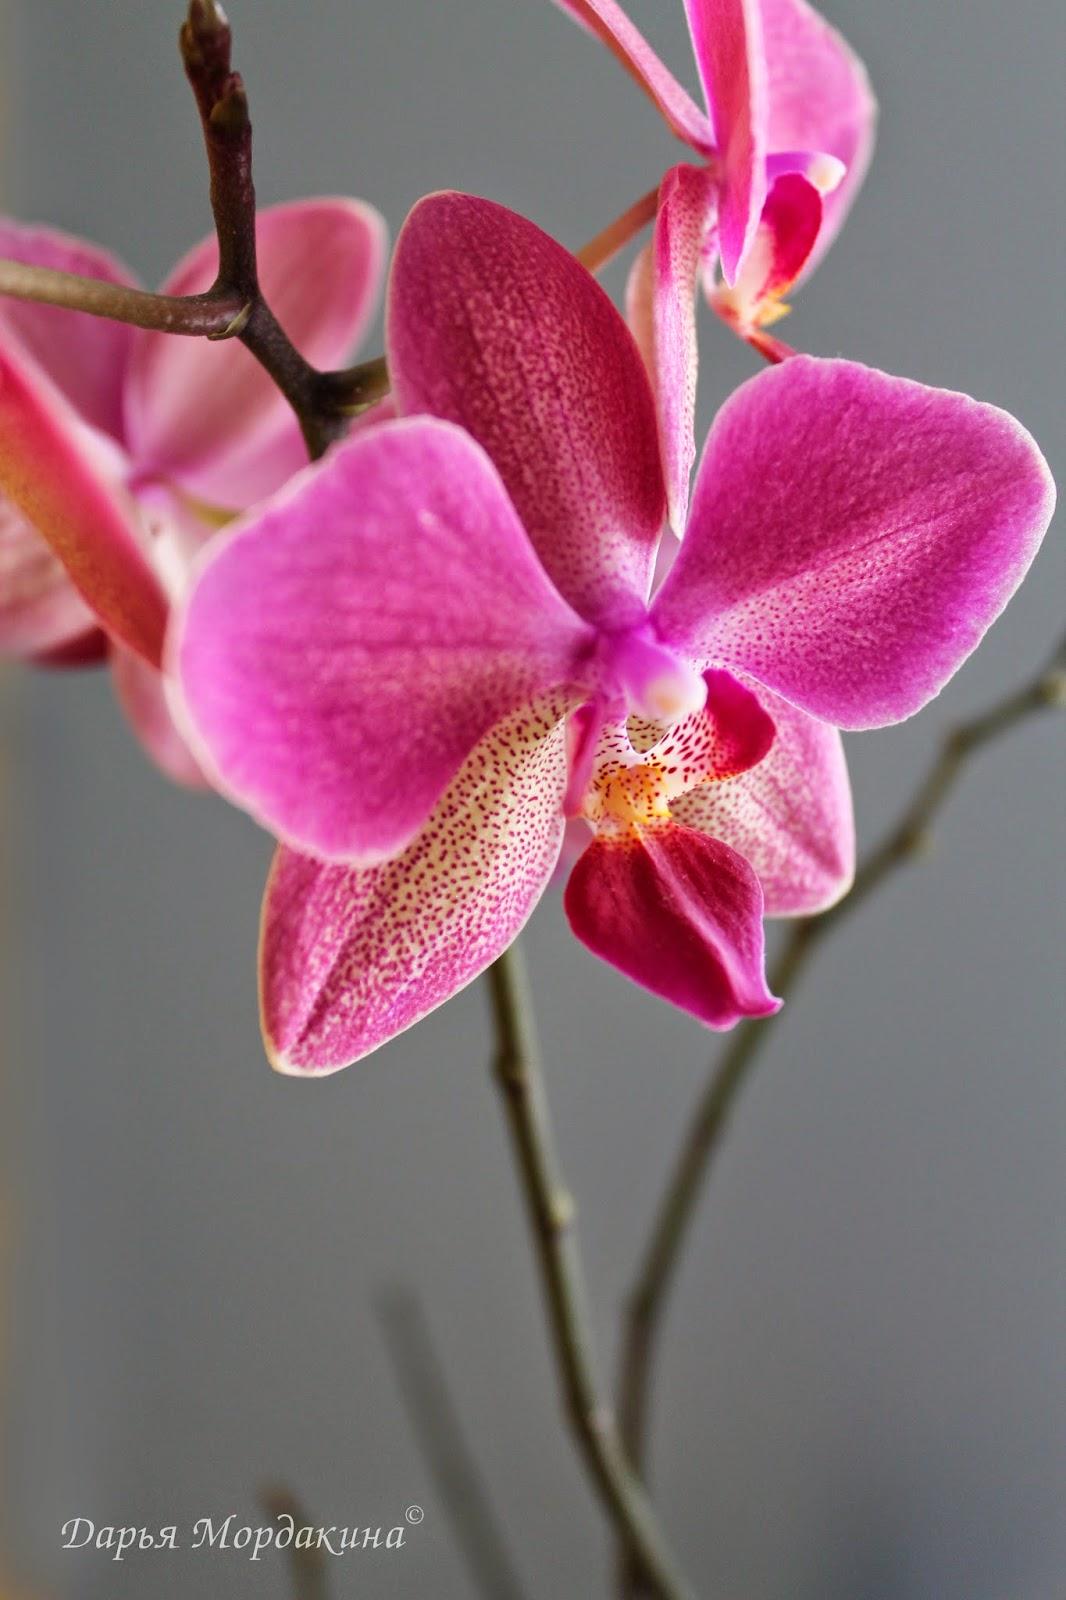 orhideja, orchid, орхидея, цветок, зима, фаленопсис, бабочка, бутон